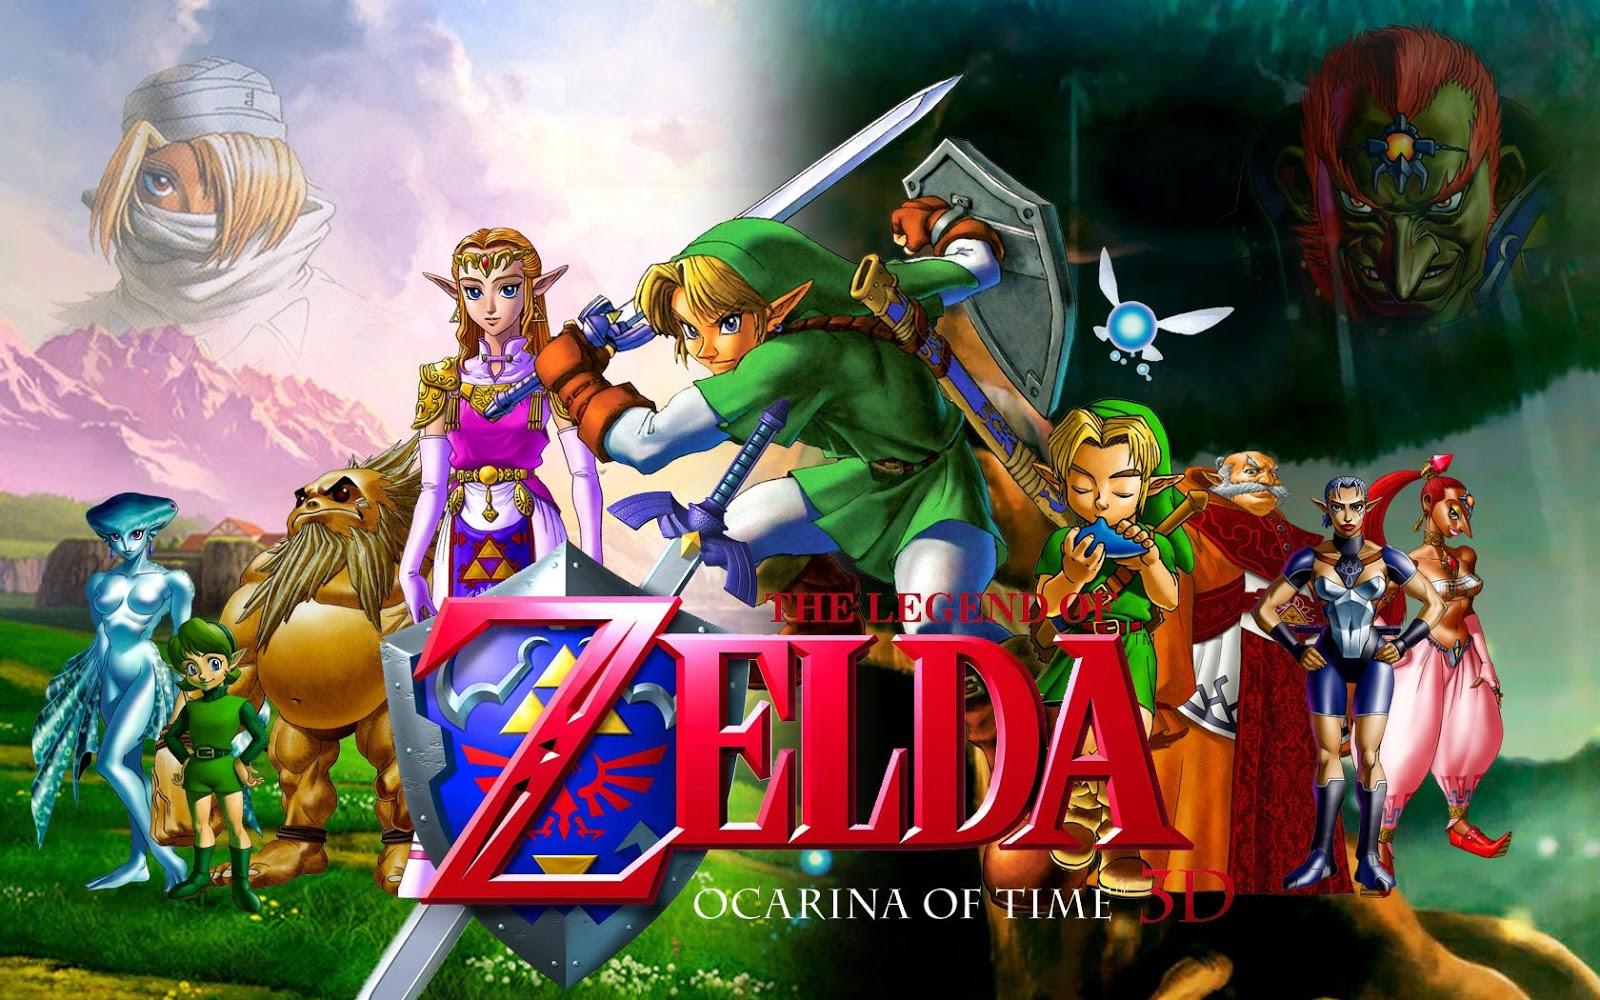 Download The Legend of Zelda: Ocarina of Time PC Games | Free Games Dekstop